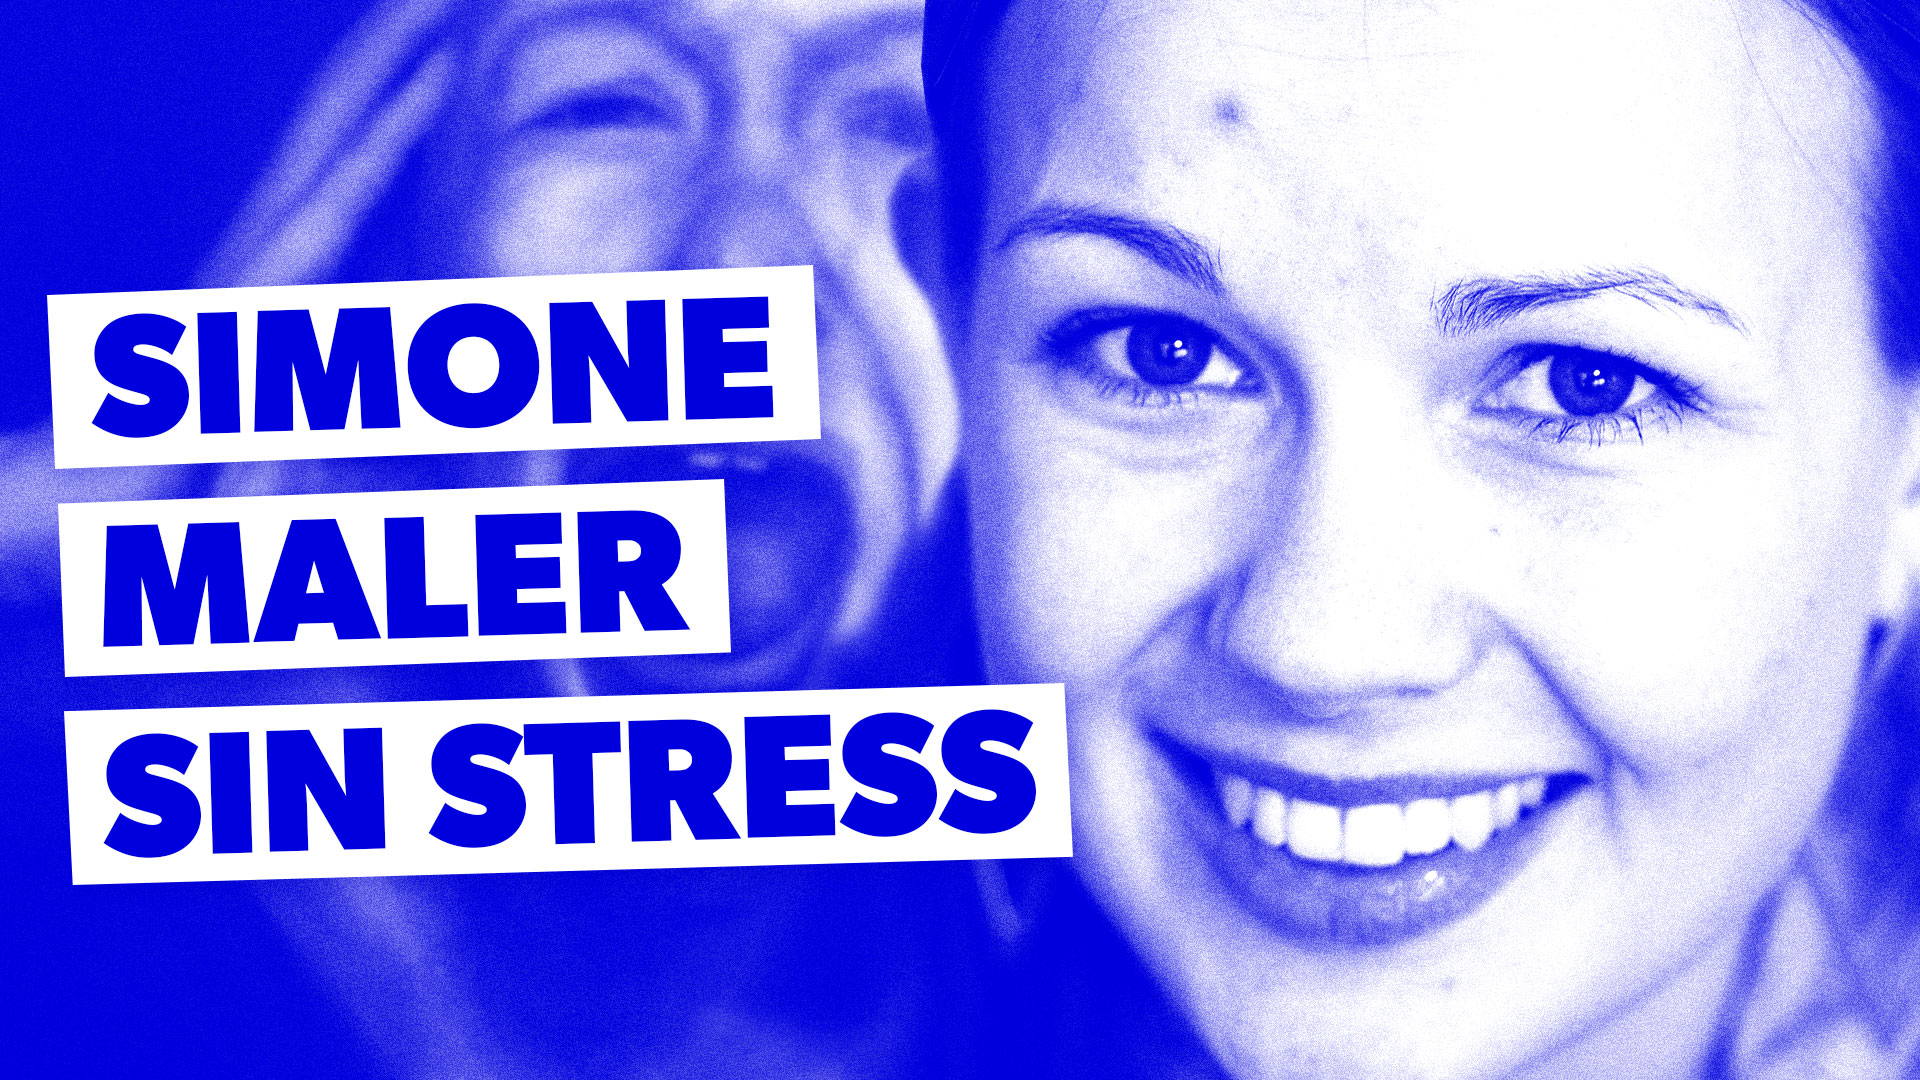 Simone maler sin stress